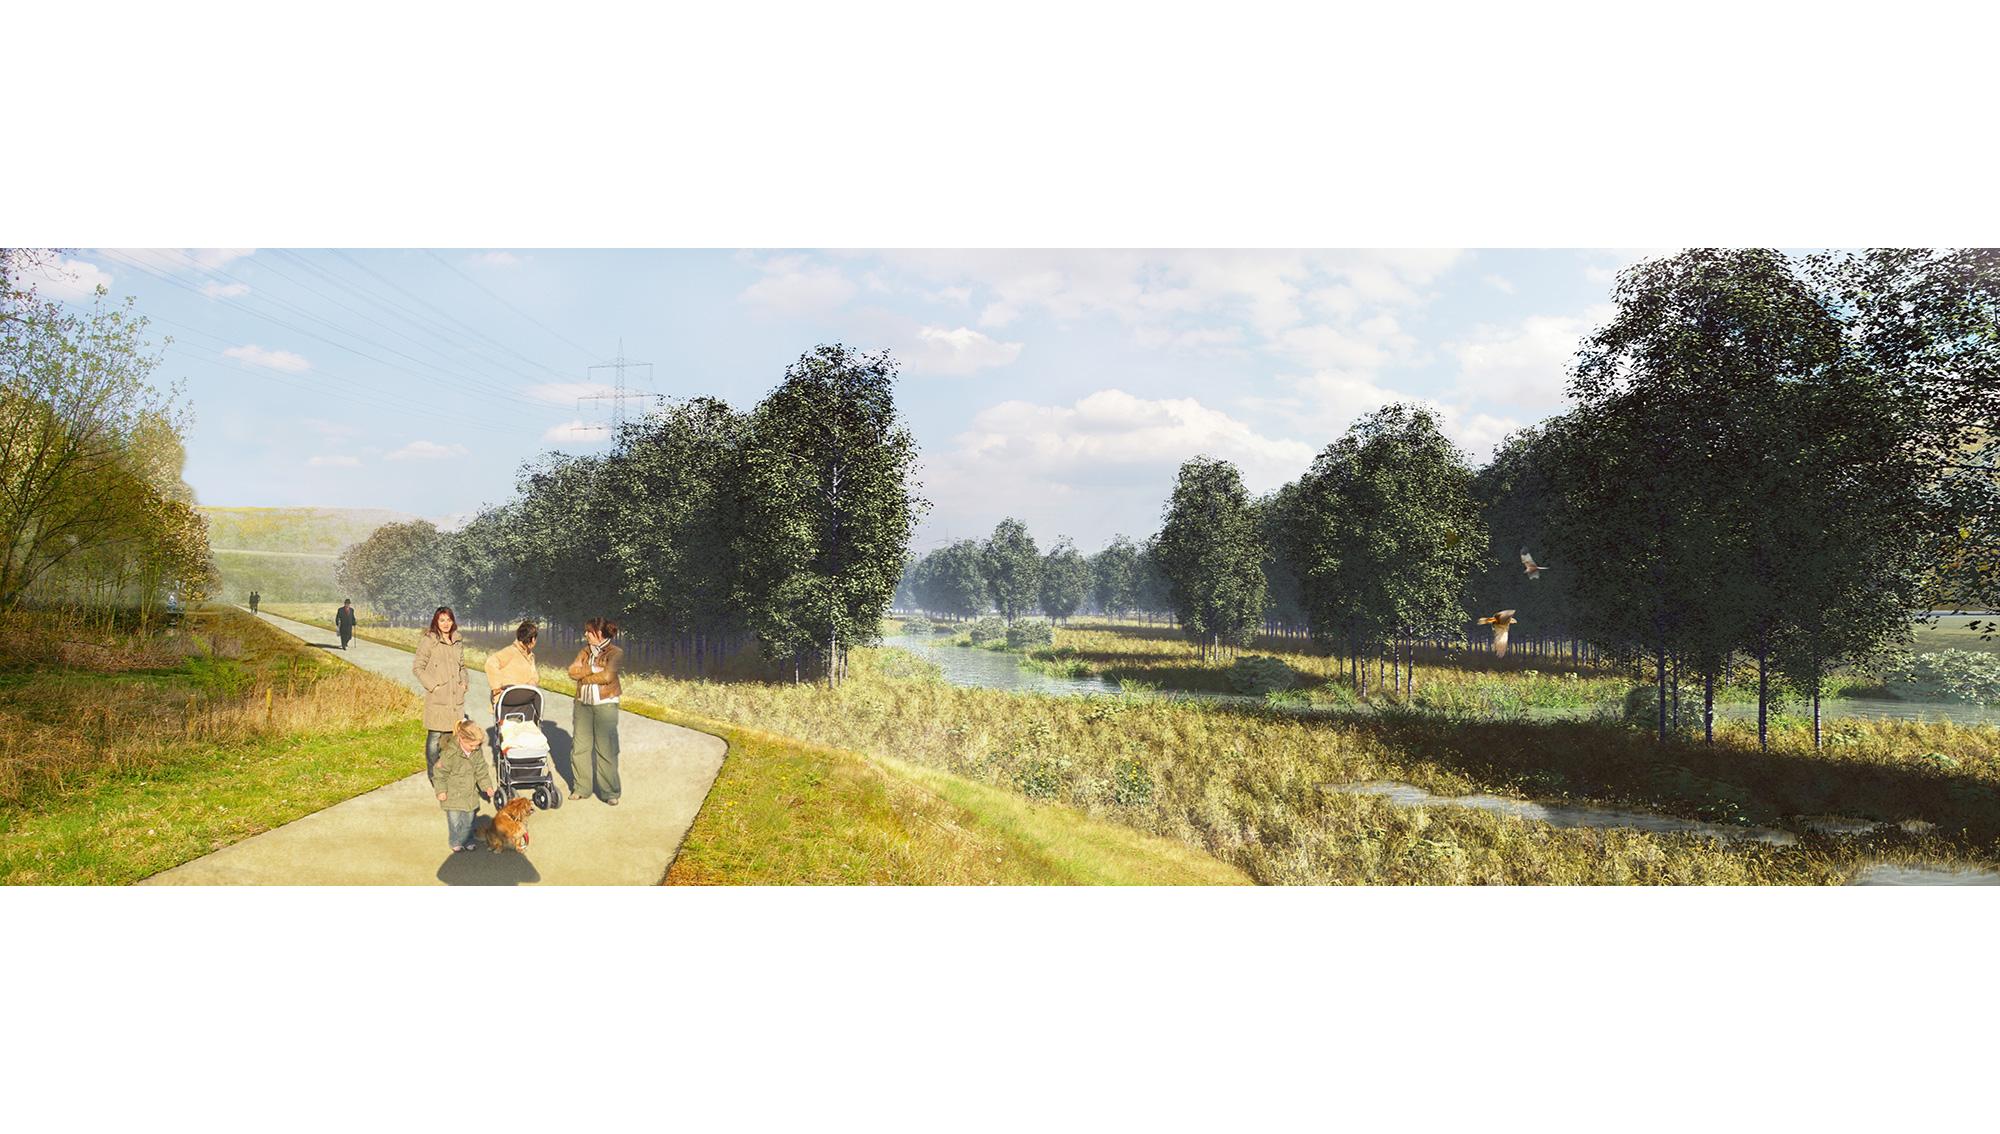 Rmp stephan lenzen landschaftsarchitekten masterplan - Rmp landschaftsarchitekten ...